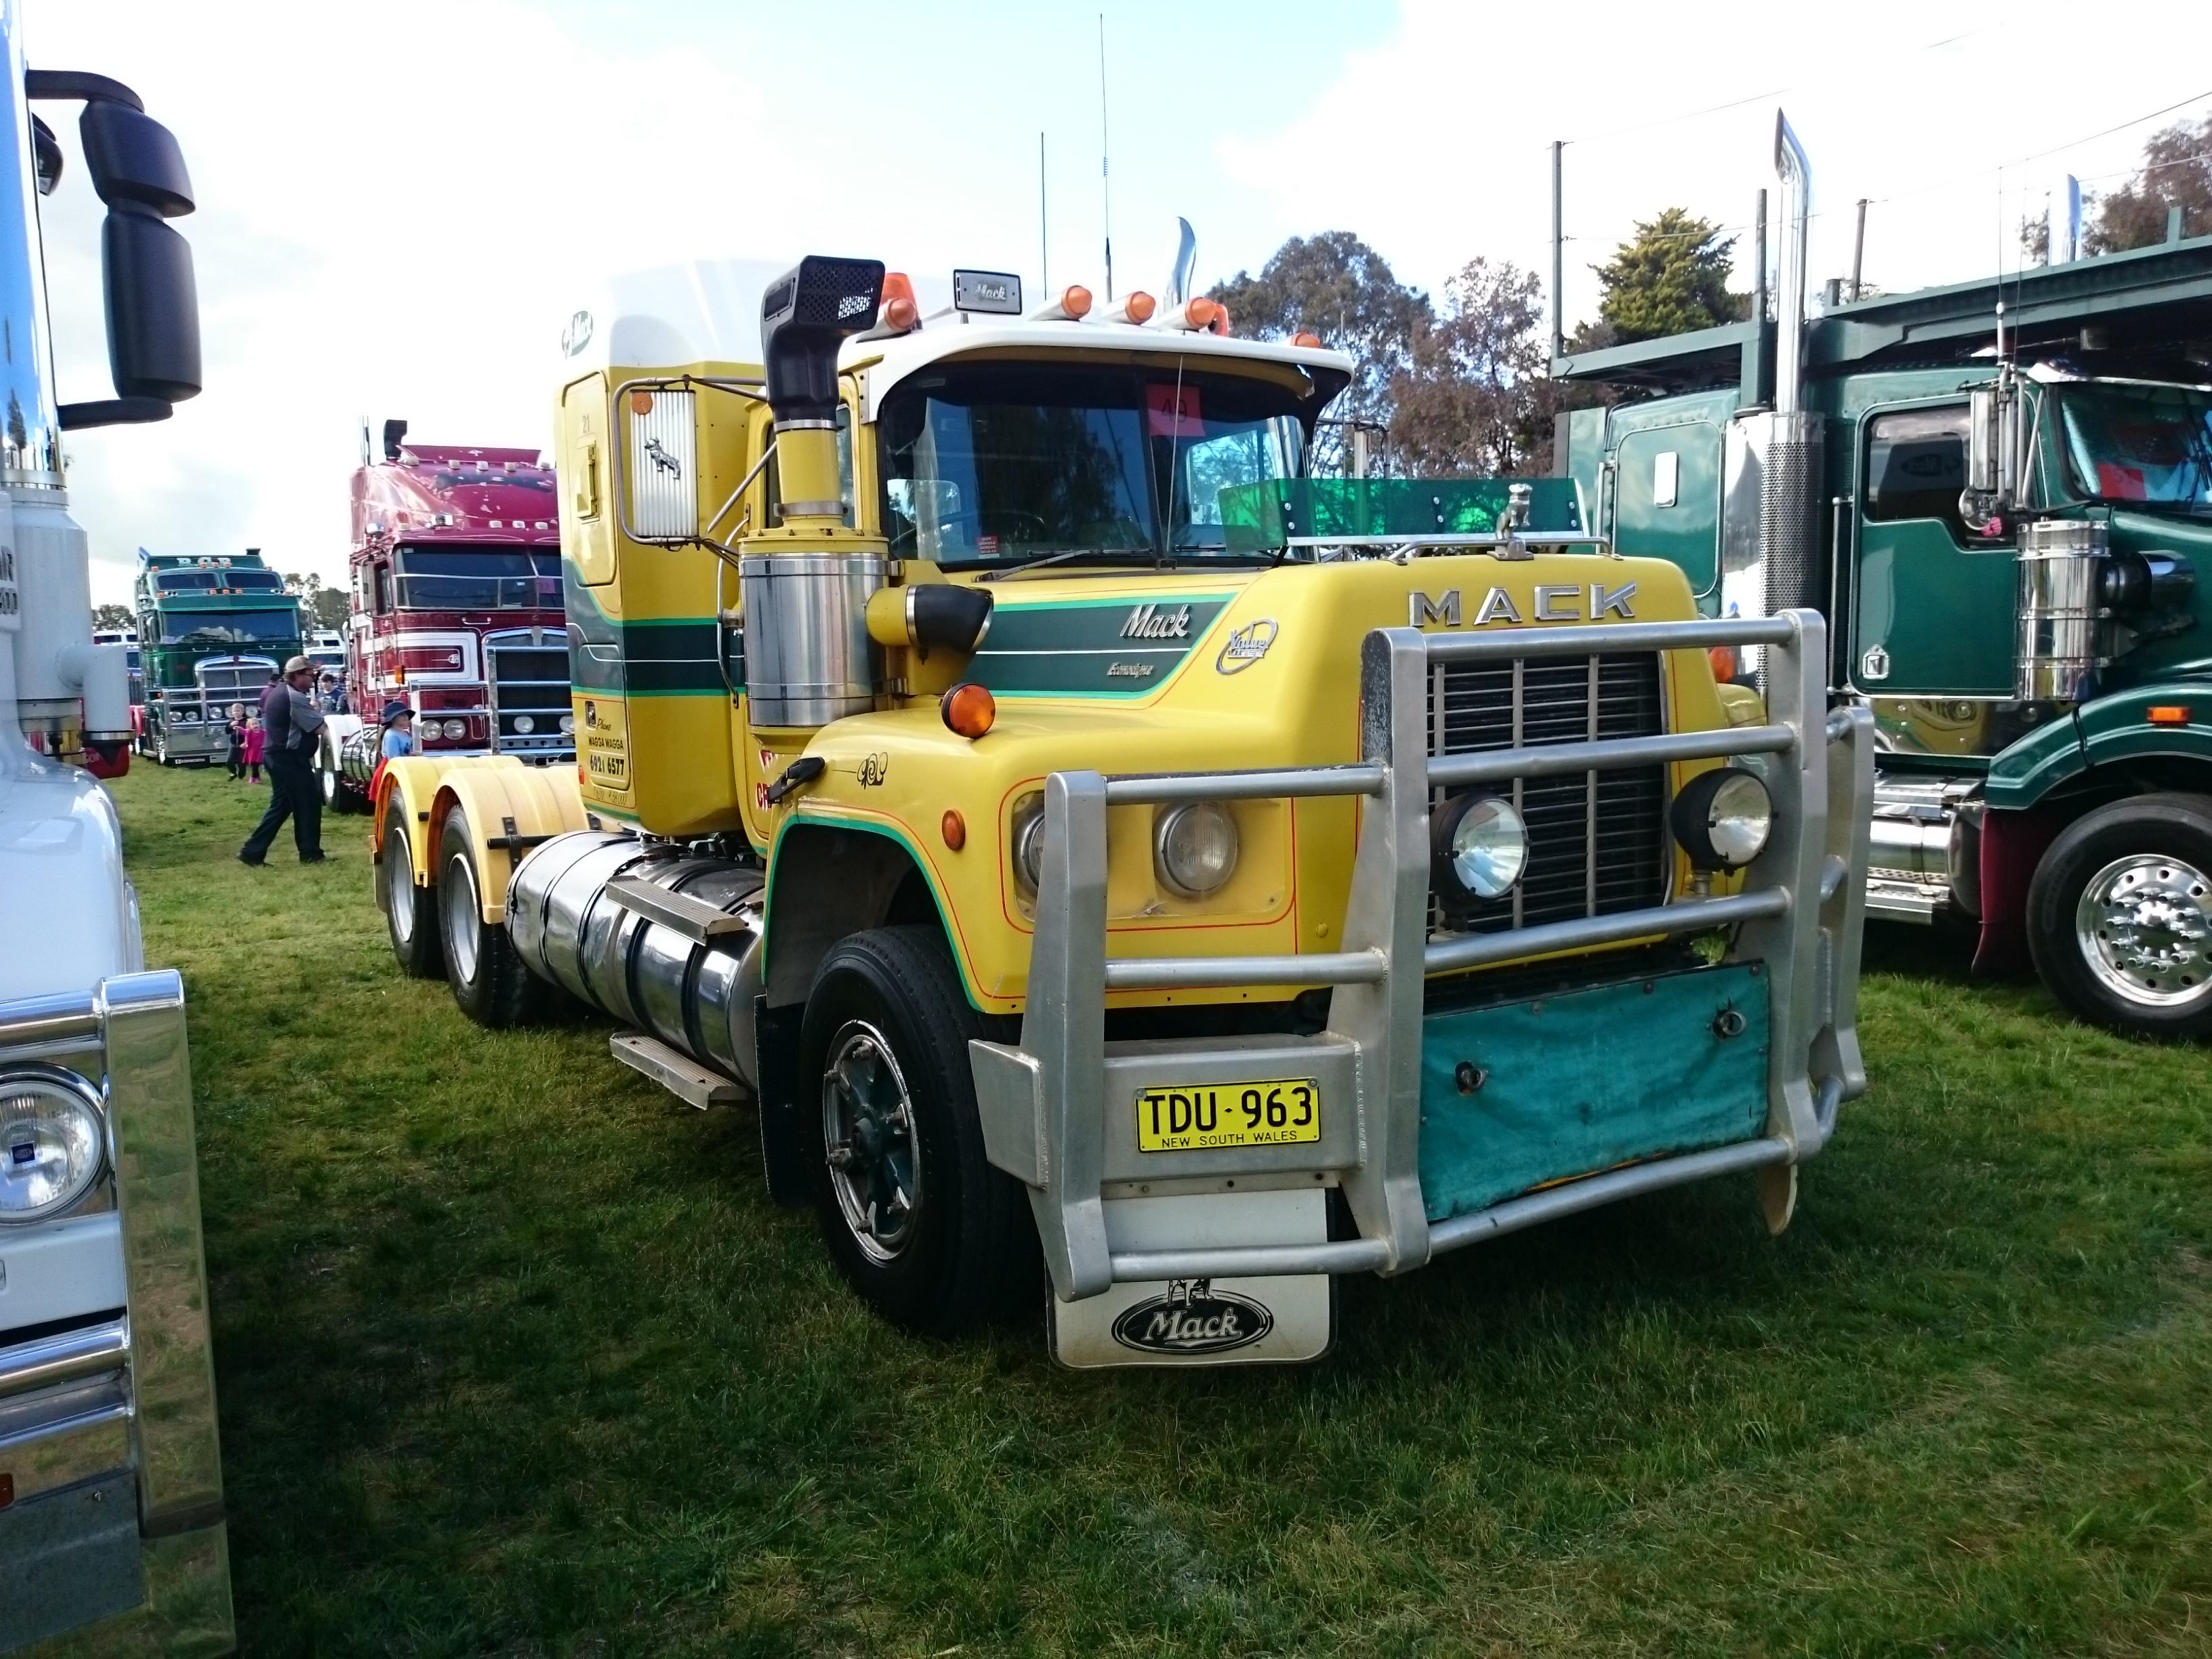 R Model Mack Show Truck : File mack r rst econodyne on display at the riverina